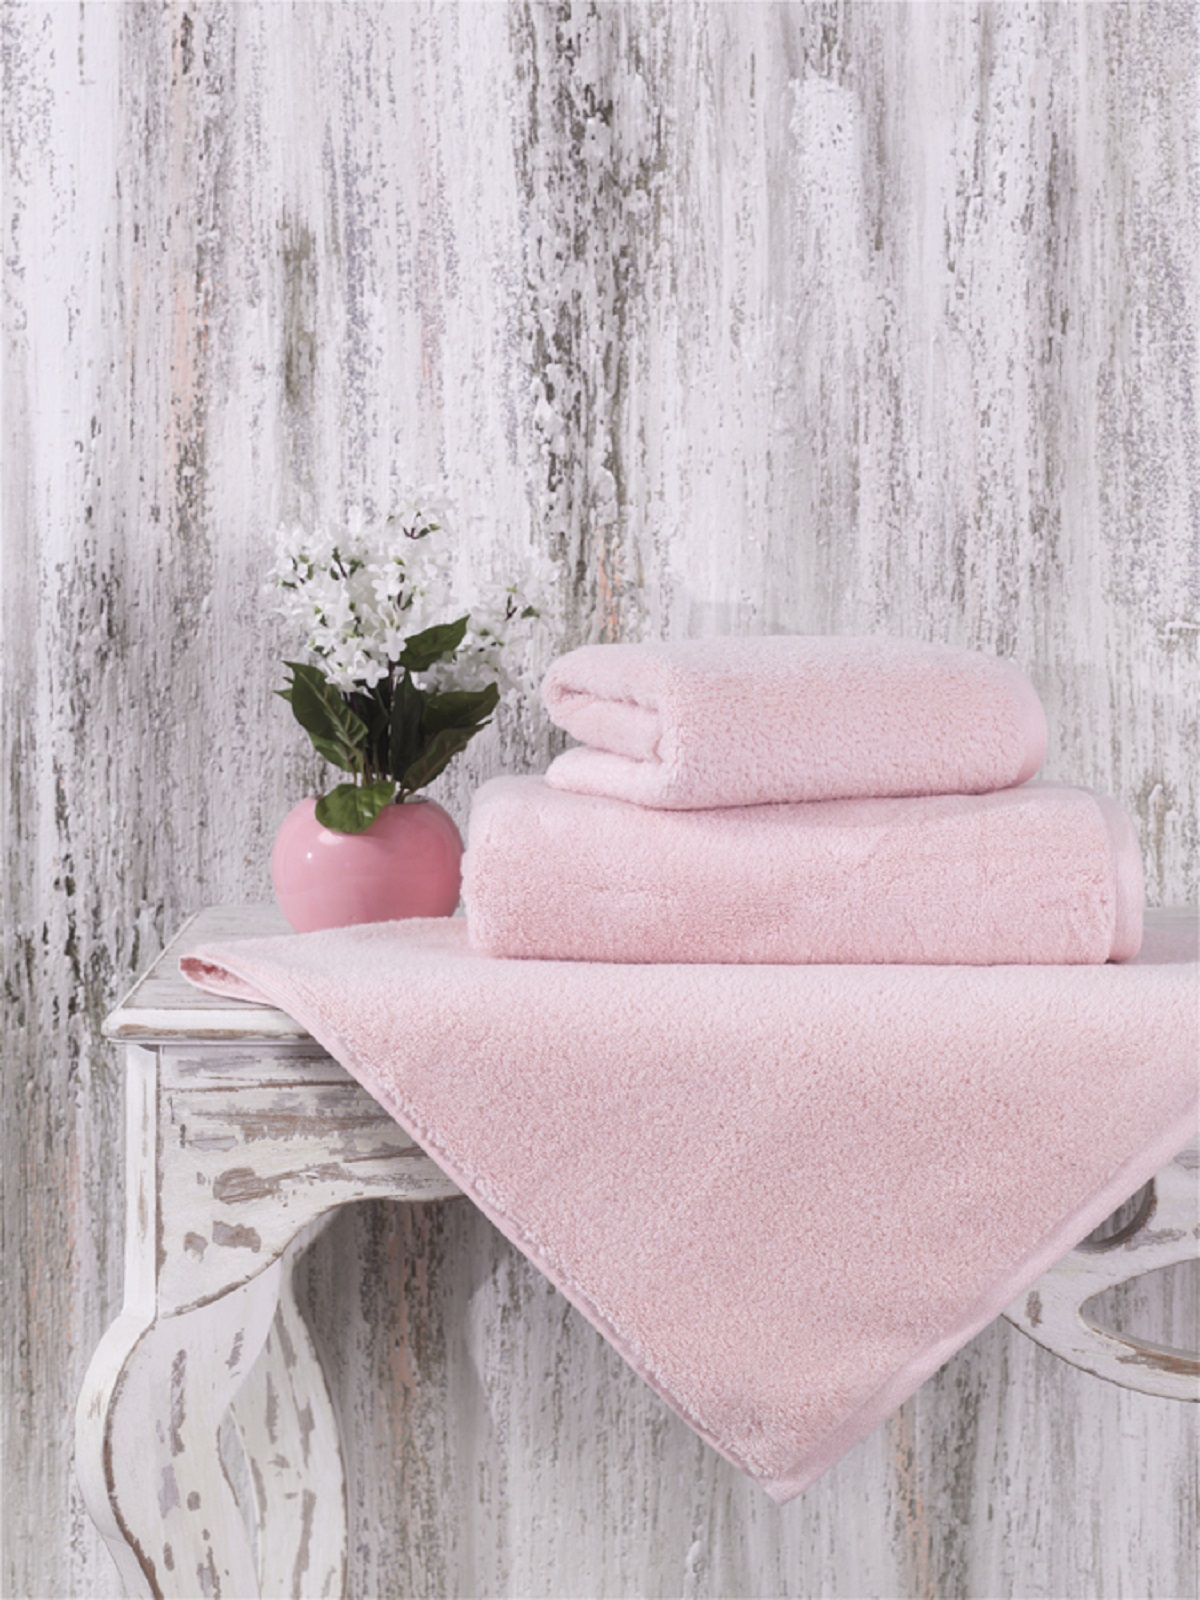 Полотенца Karna Полотенце Mora Цвет: Пудра (70х140 см) полотенца karna полотенце iteka цвет коричневый 70х140 см